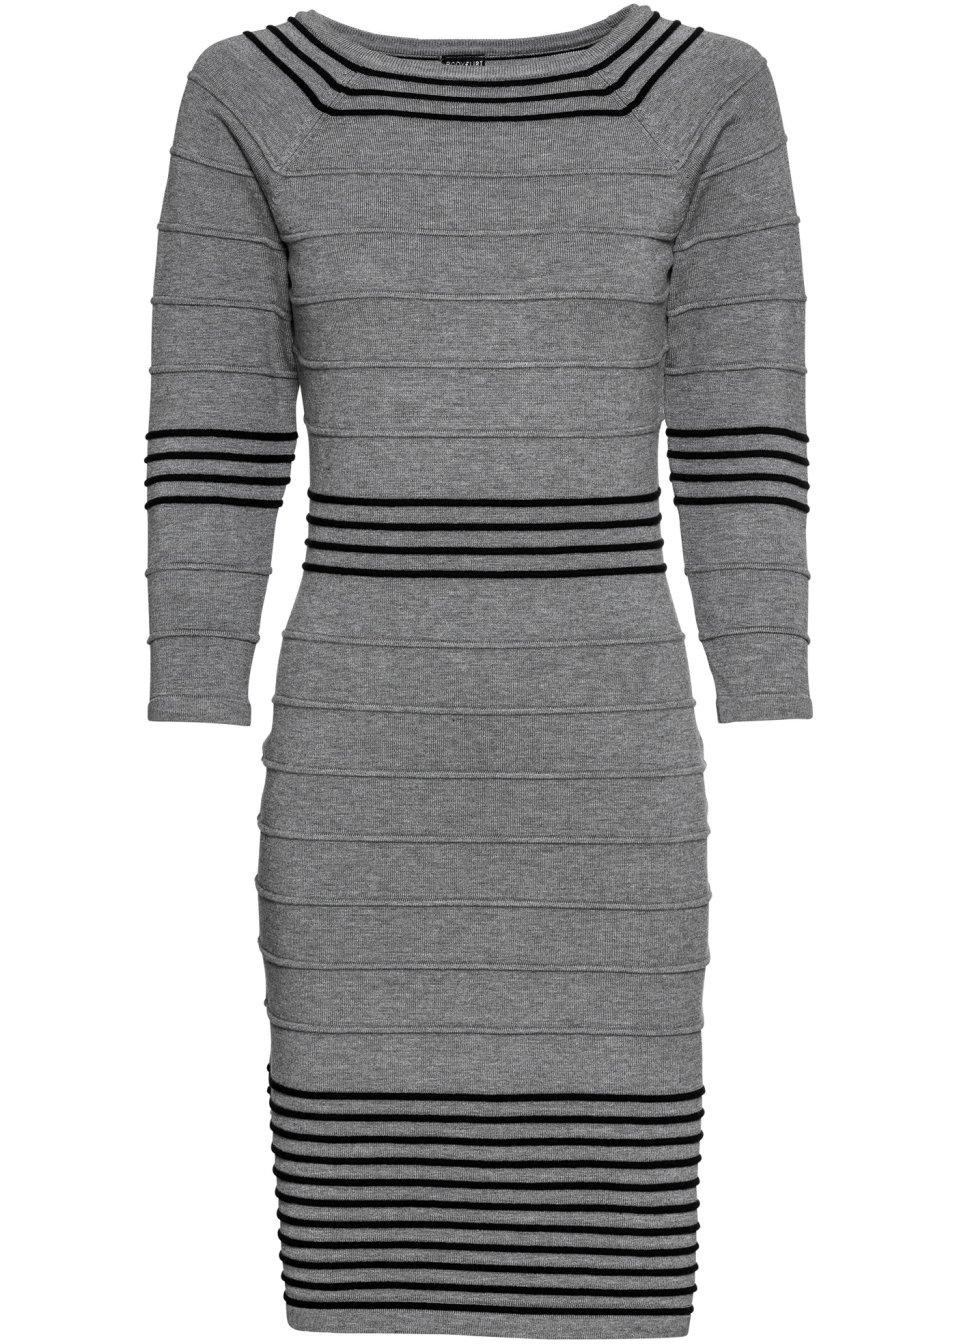 Attraktives Strickkleid mit Carmen-Ausschnitt - grau meliert/schwarz wadeW XoKnk